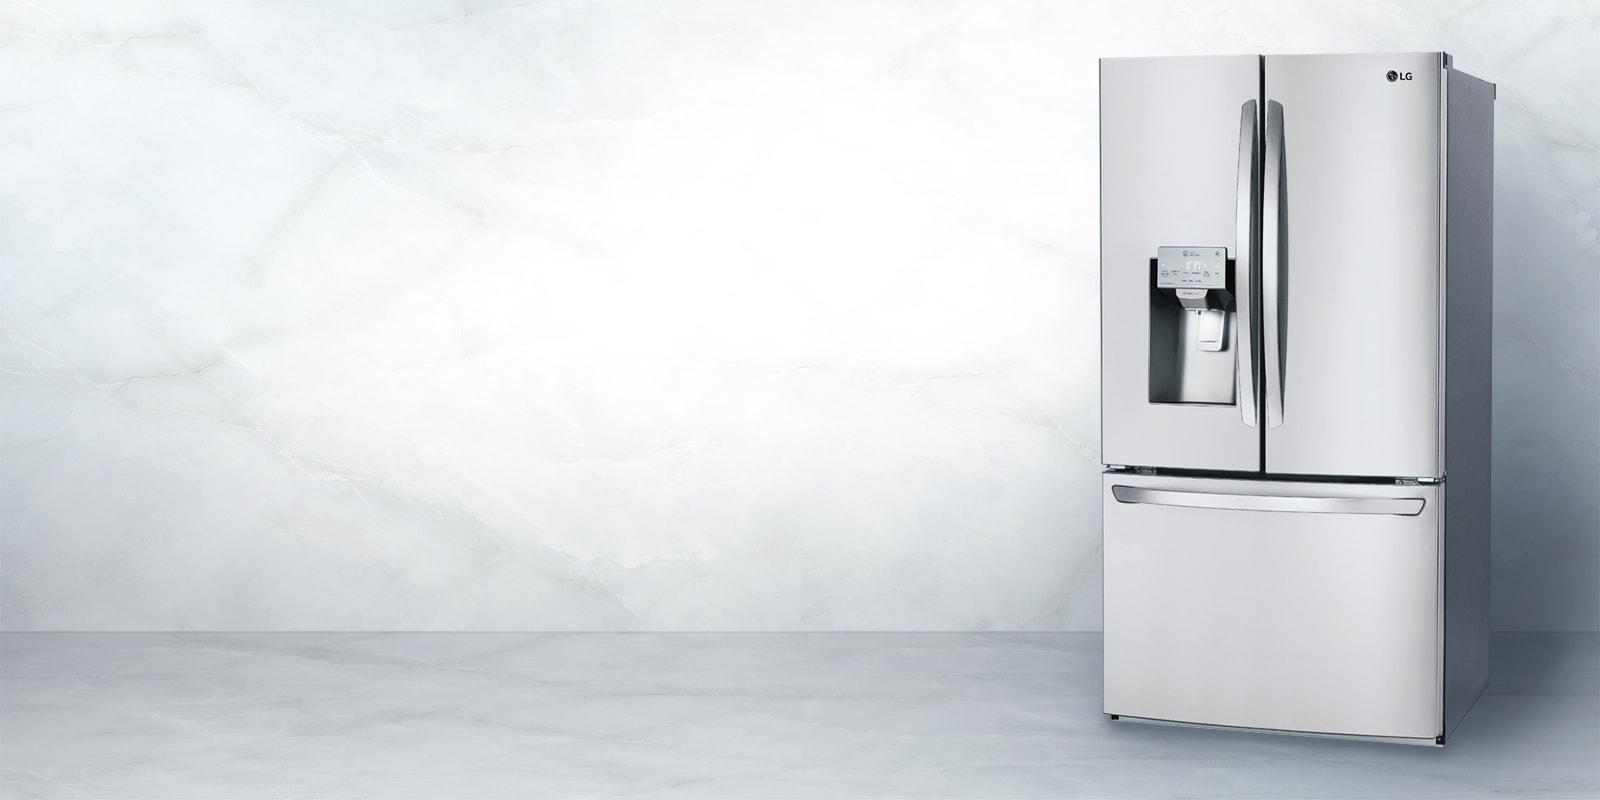 LG Promotions: Deals on Home Appliances, TVs ... - lg.com